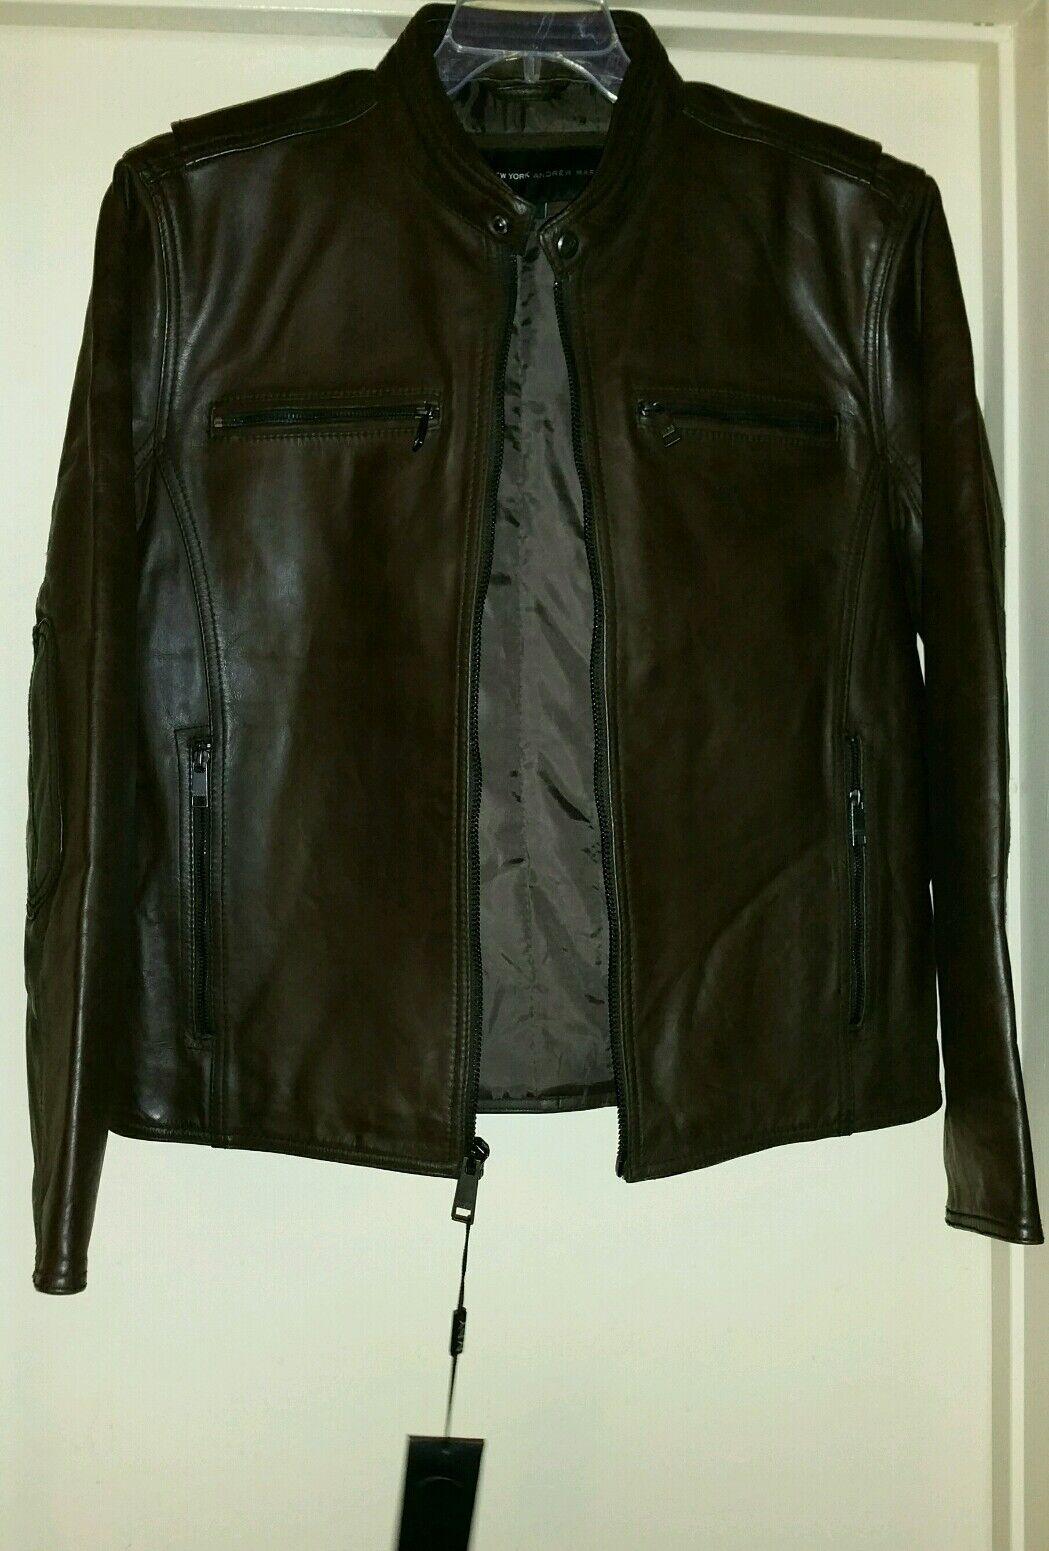 Andrew Marc Men's XLarge Leather Coat